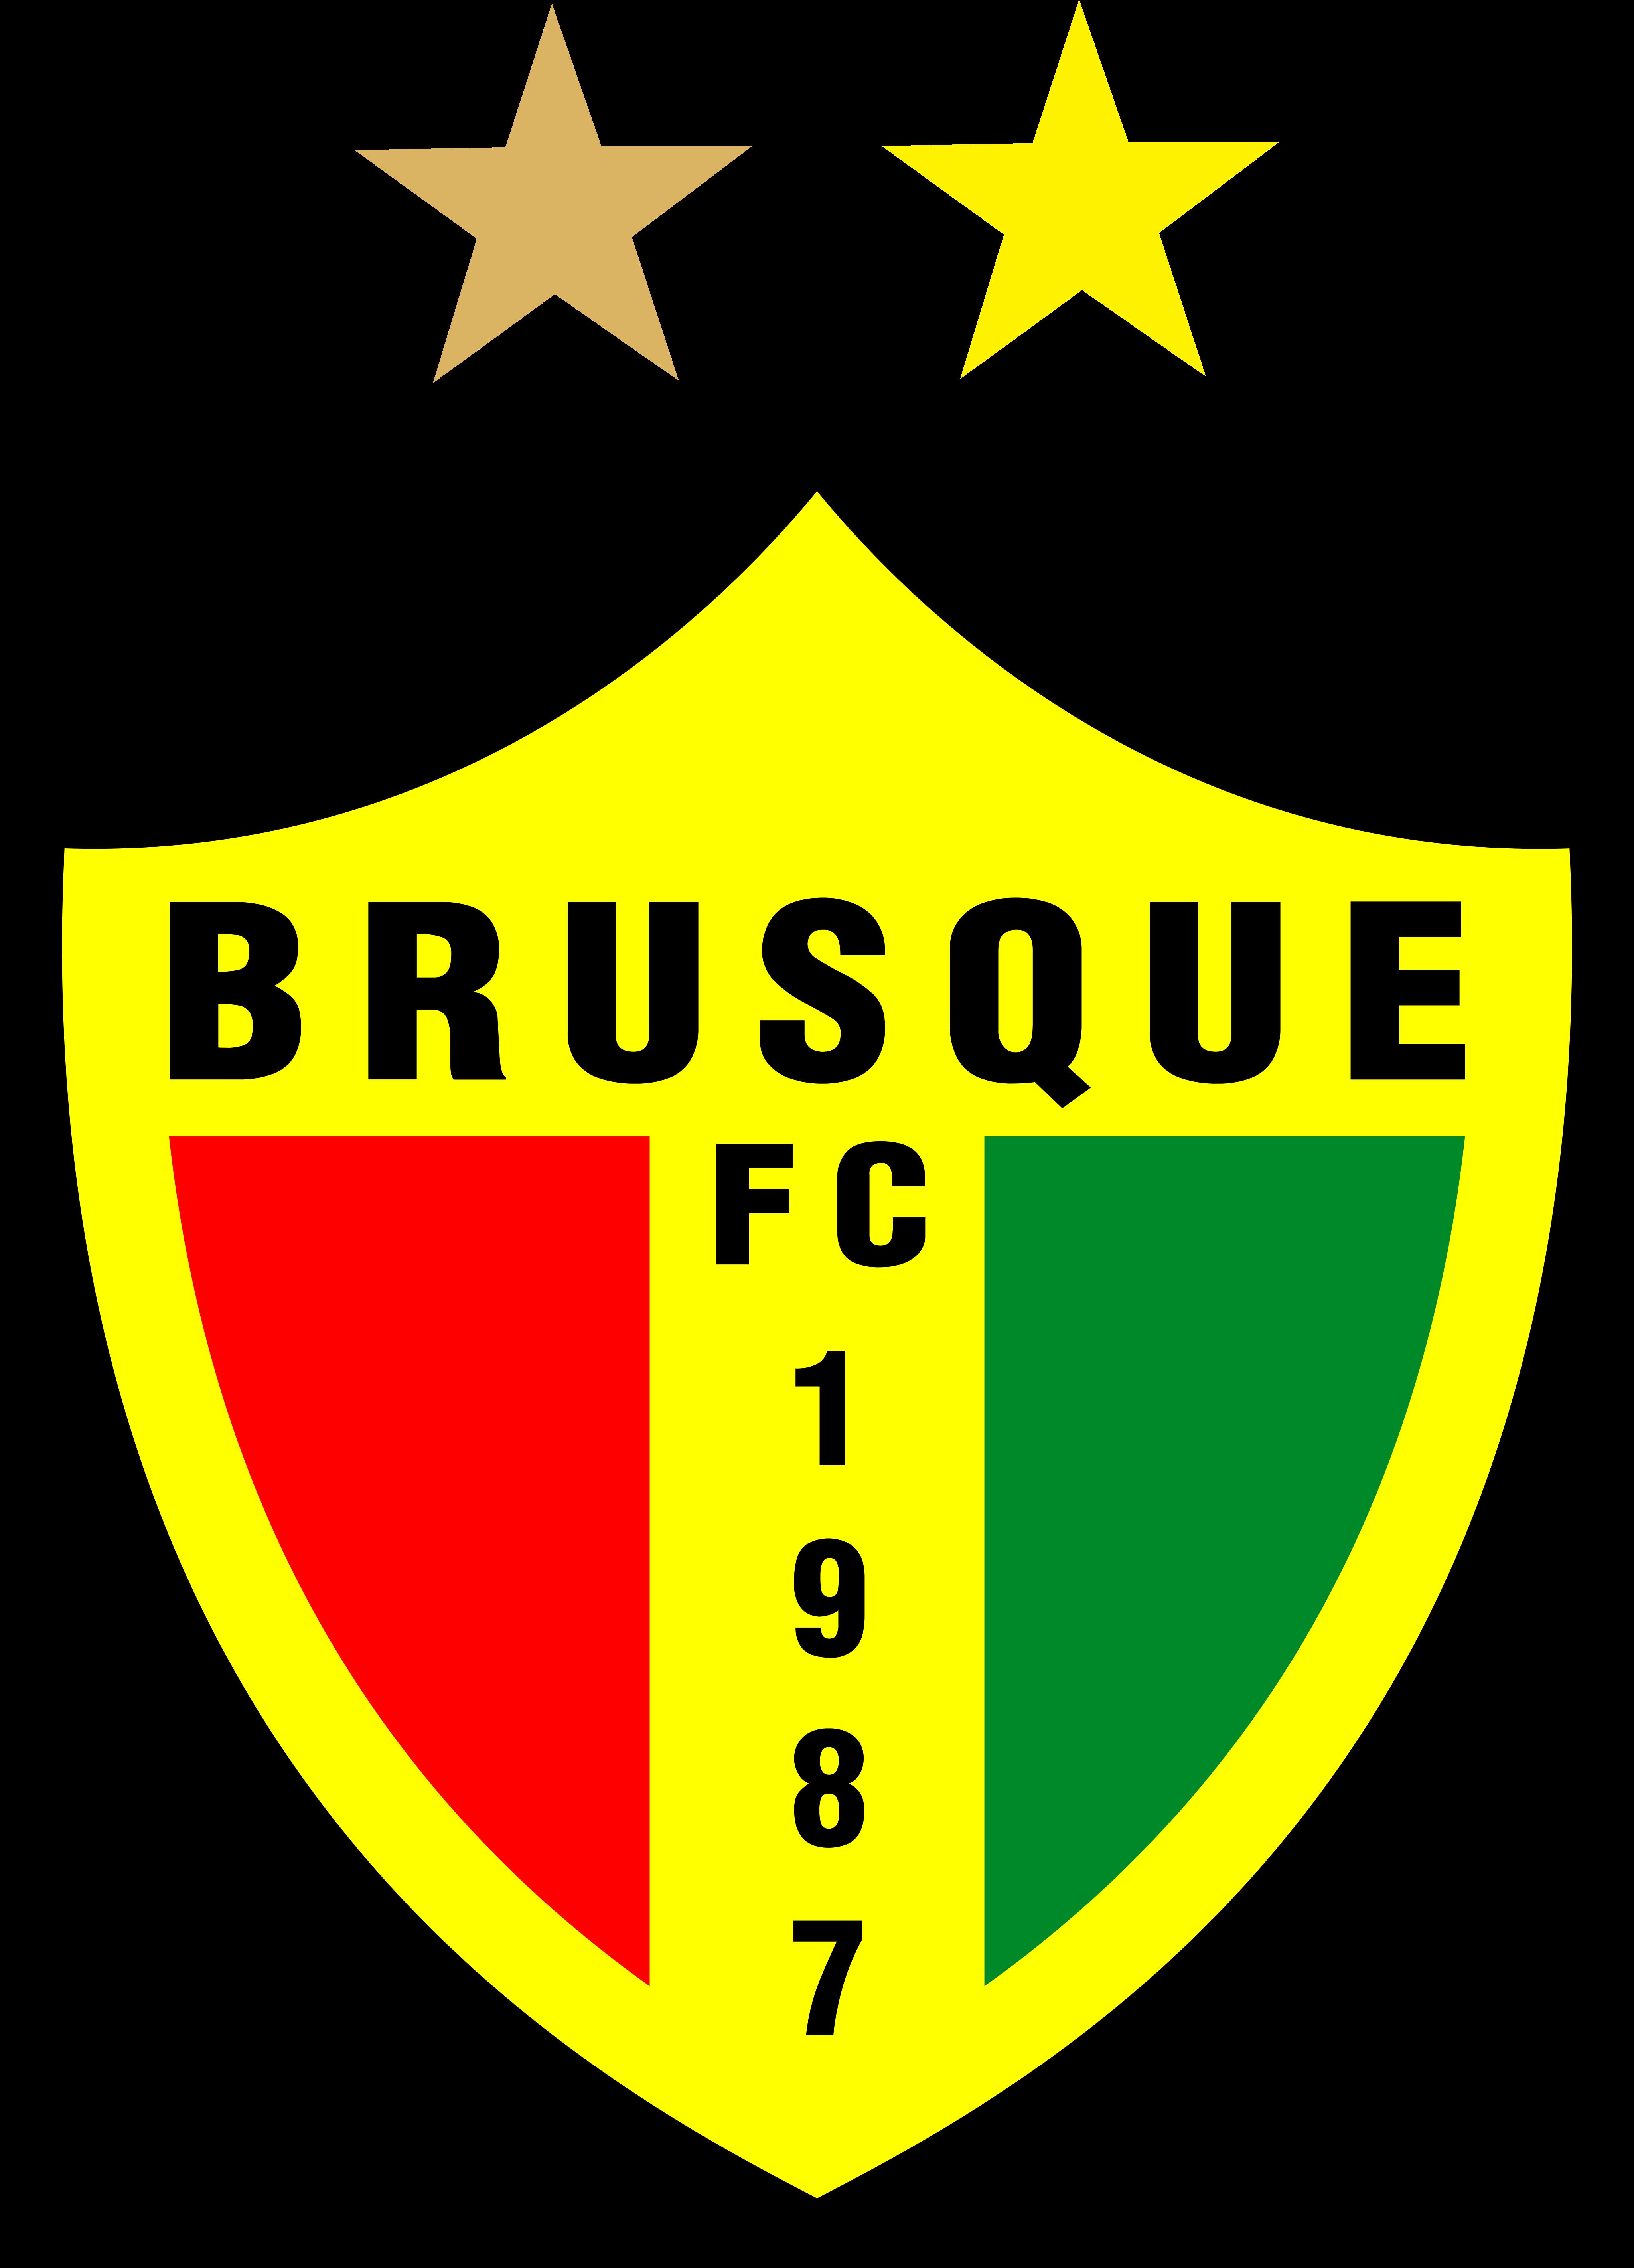 brusque fc logo - Brusque FC Logo (Brazil)